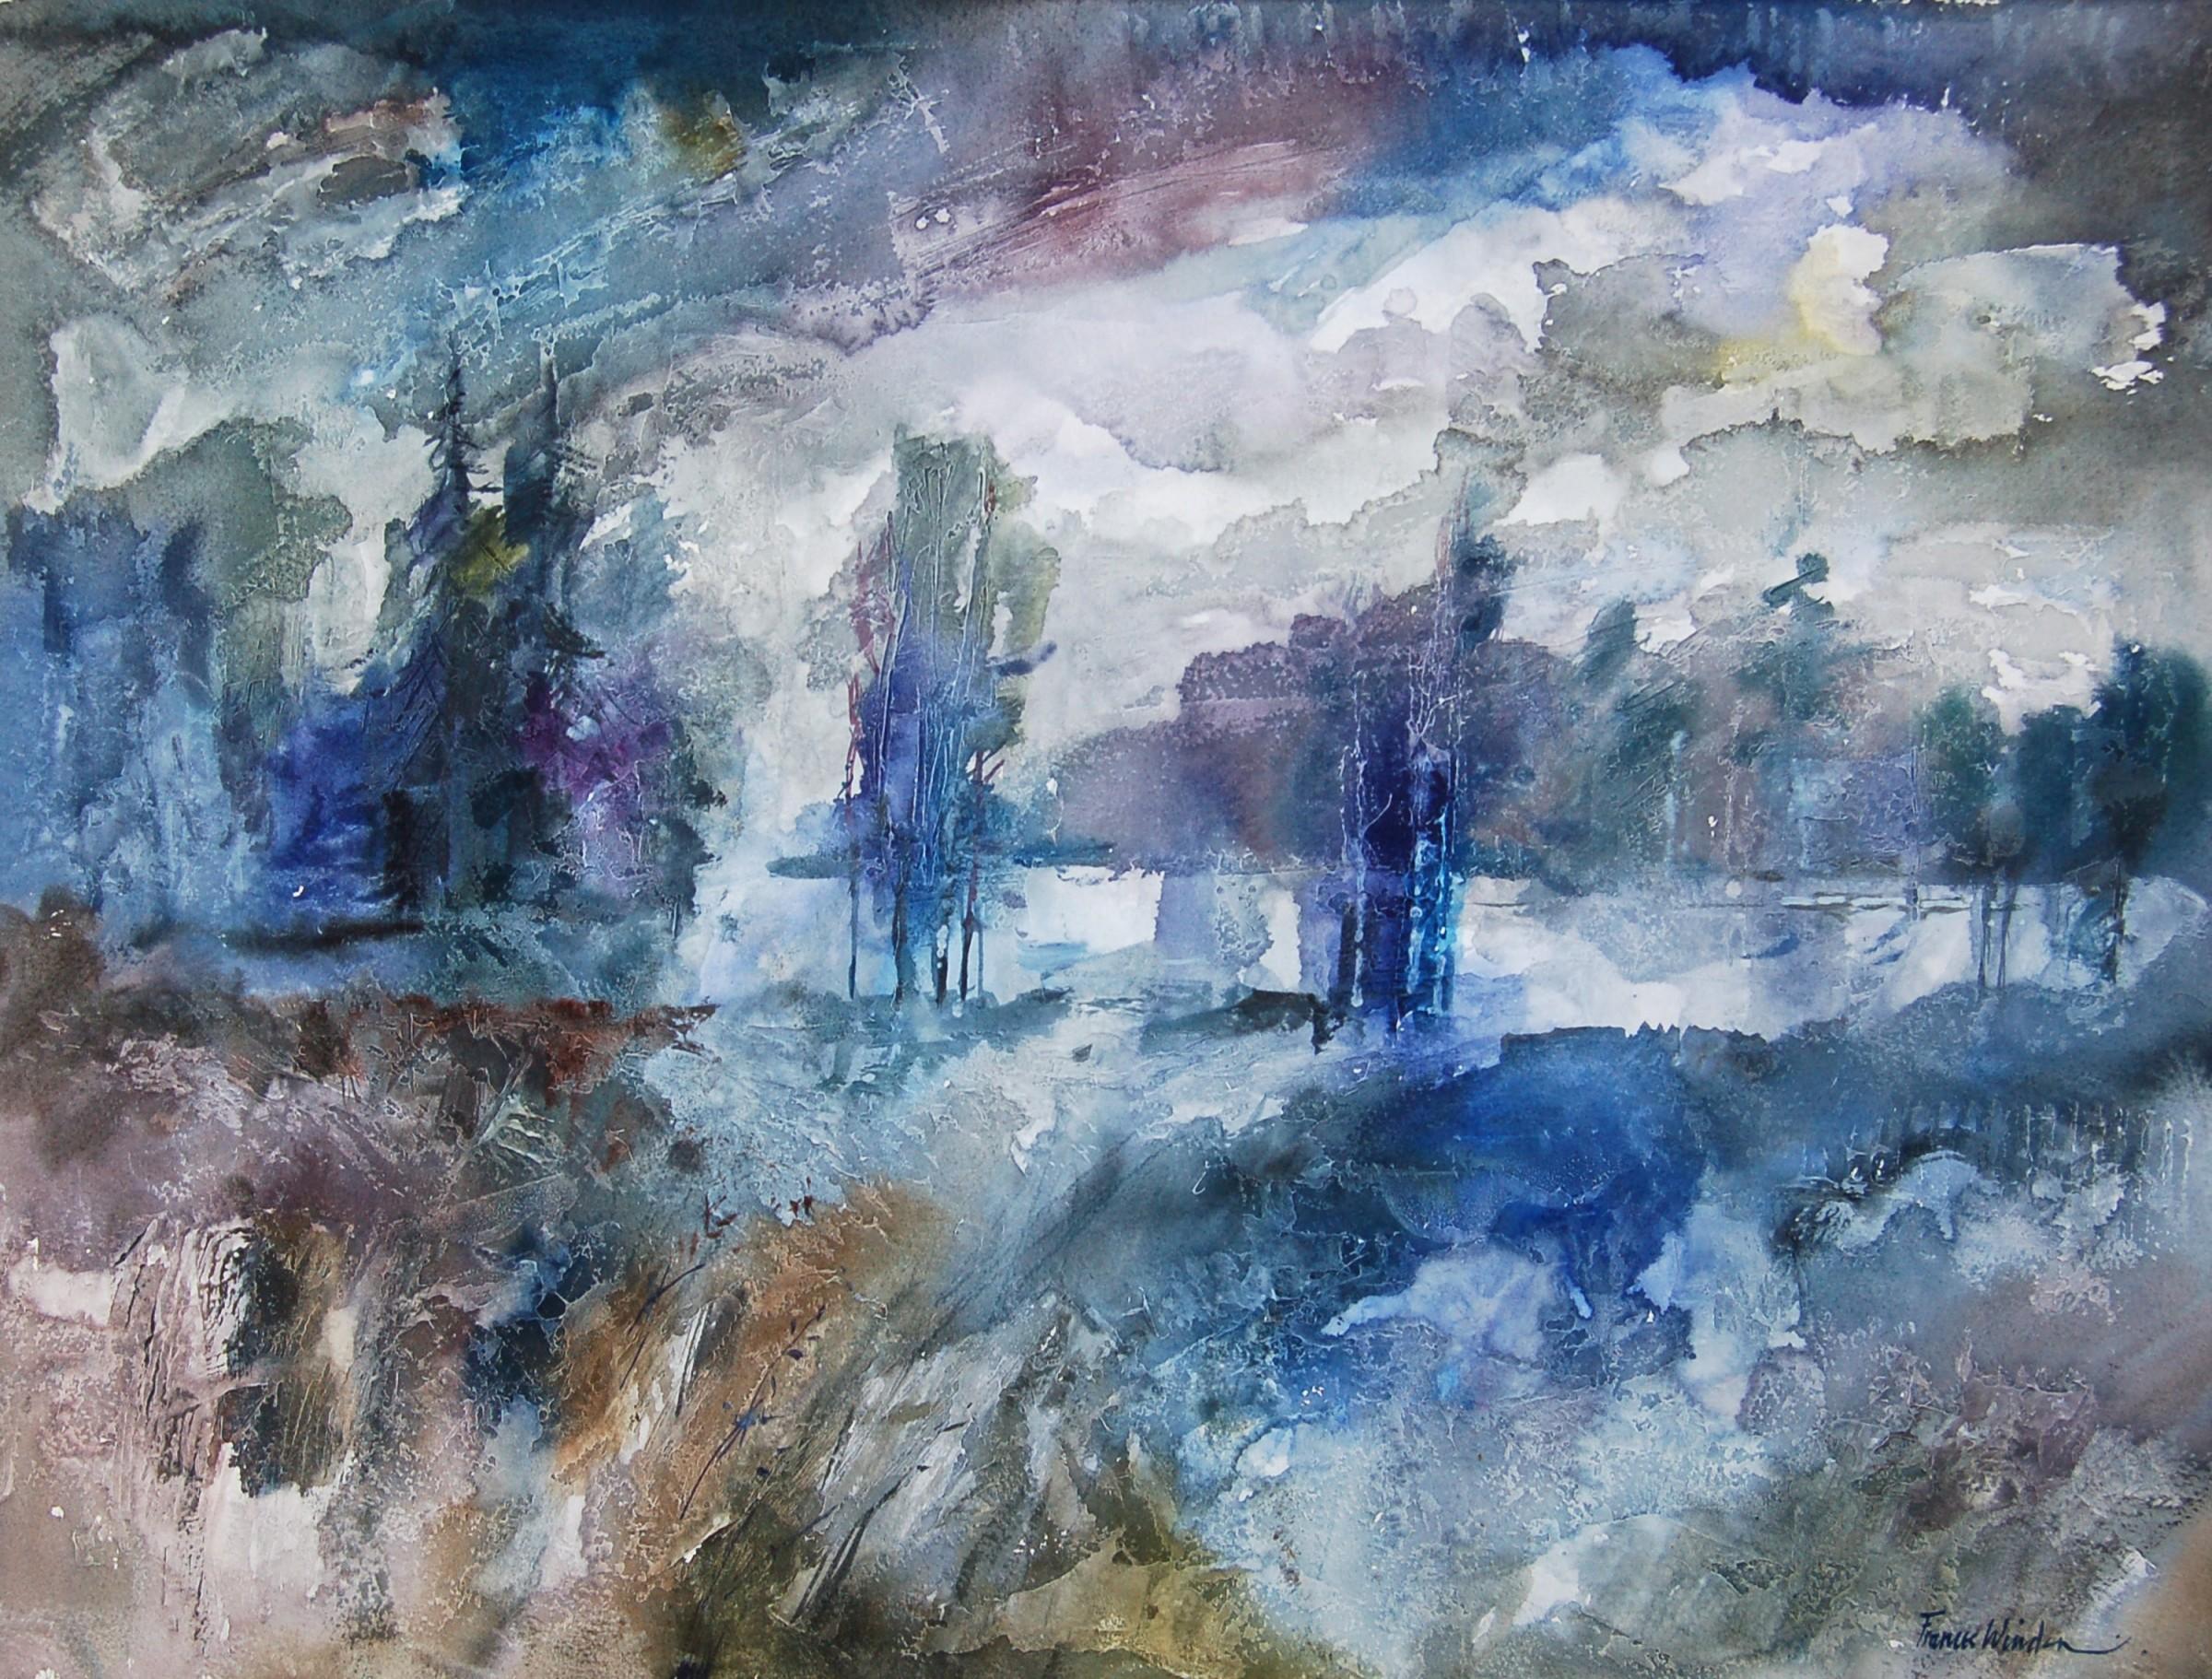 <span class=&#34;link fancybox-details-link&#34;><a href=&#34;/exhibitions/16/works/image_standalone341/&#34;>View Detail Page</a></span><p>Frances Winder,&#160;<em>Winter Lake</em>, &#163;600</p>